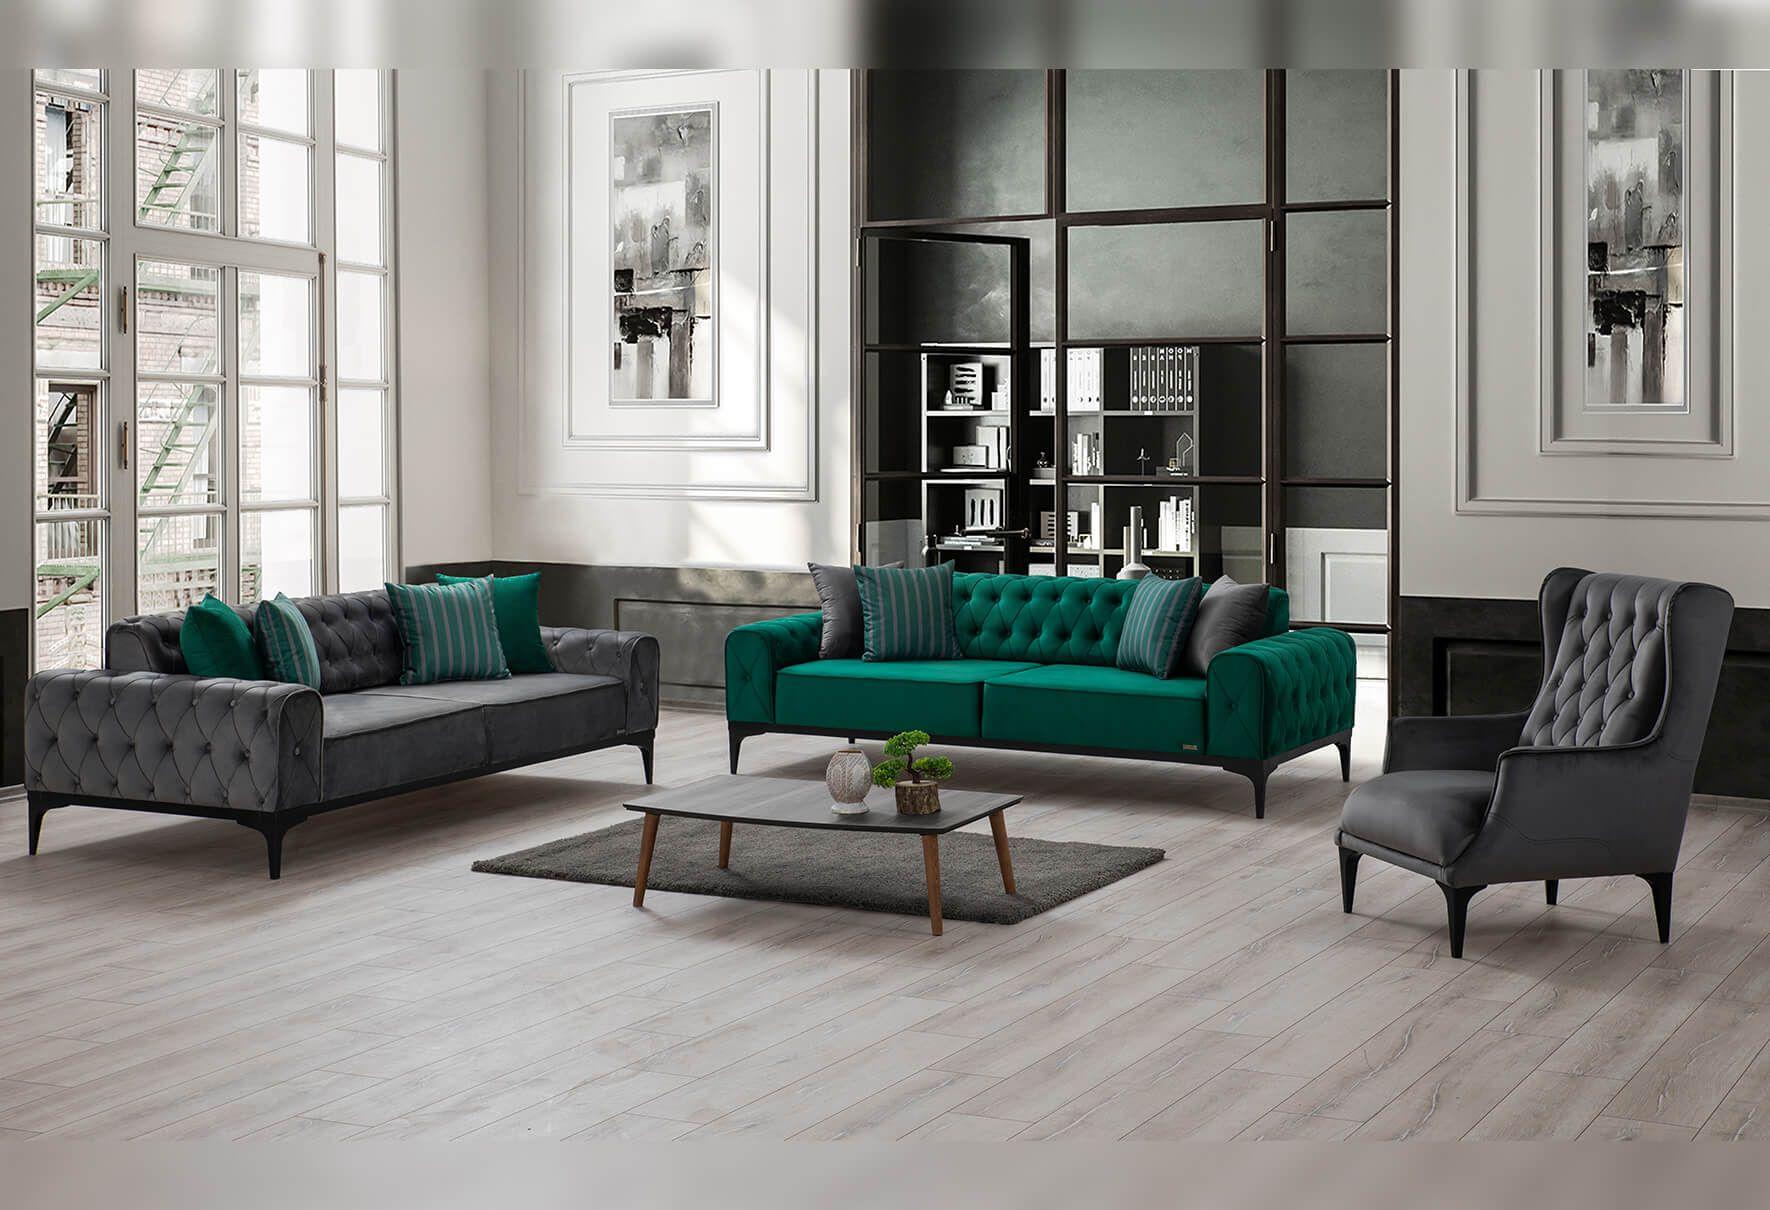 Lotus Koltuk Takimi In 2020 Home Decor Furniture Decor